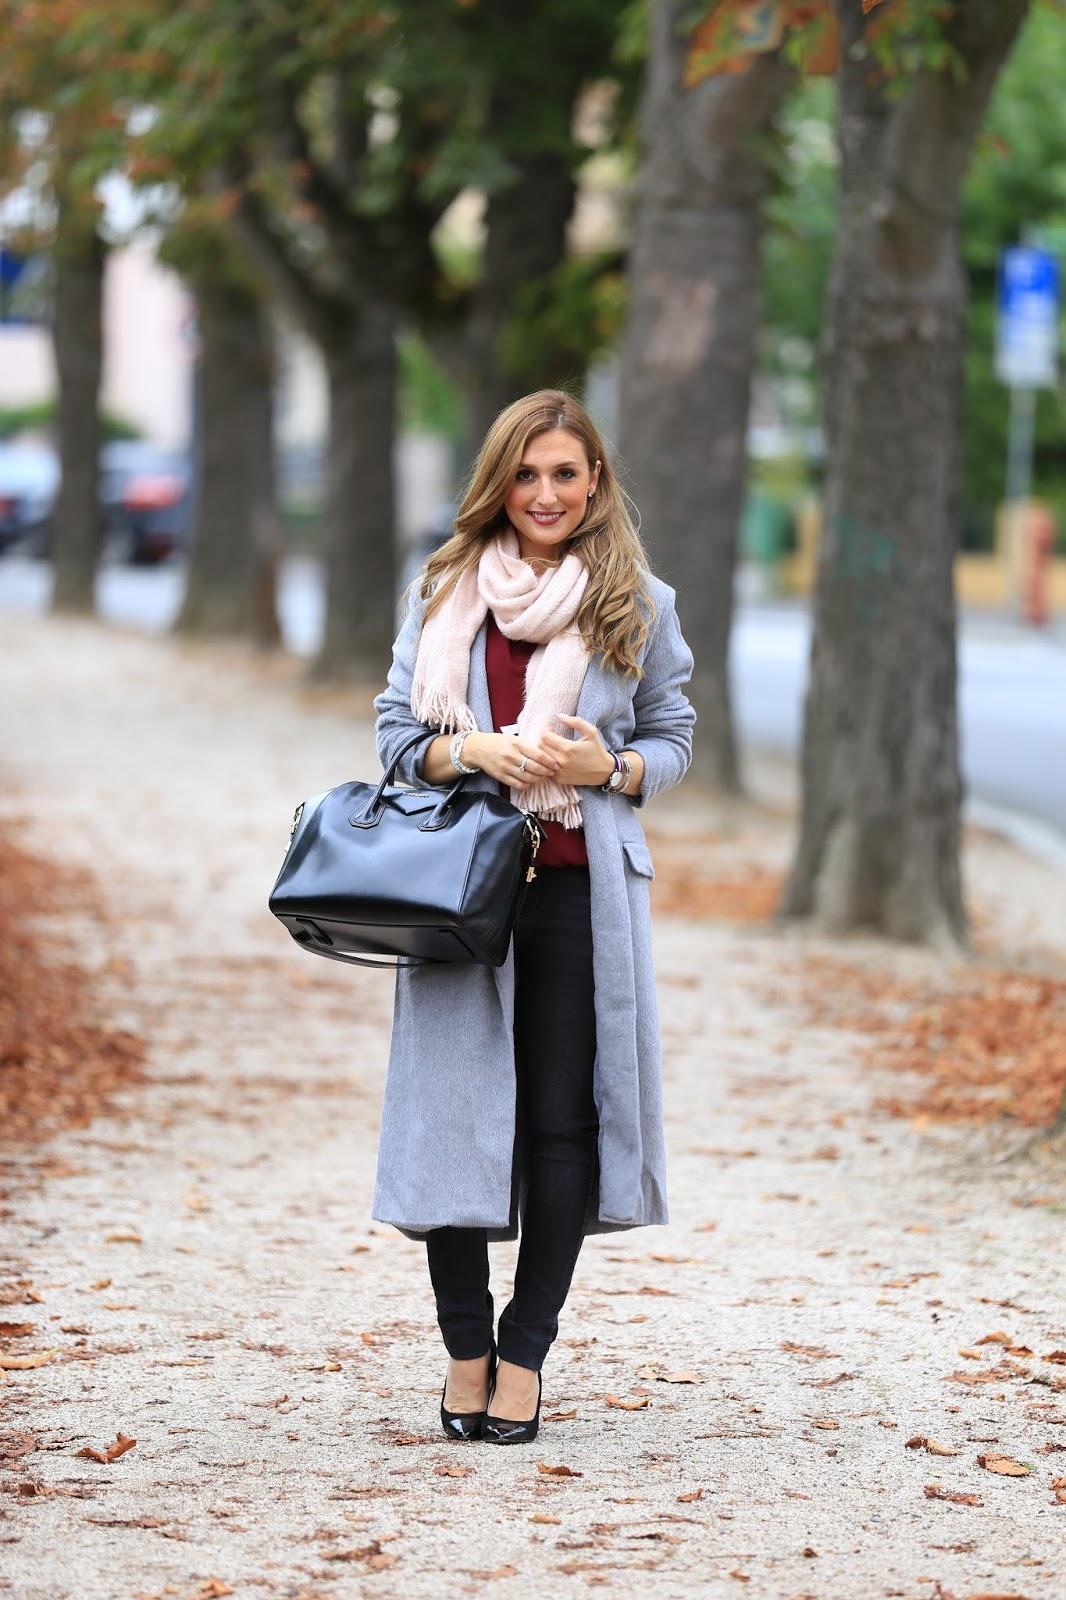 Zara-Grauer Mantel- Wolford-Dior-so-real-Fashionblogger-Frankfurt-Deutschland-Fashionstylebyjohanna - header